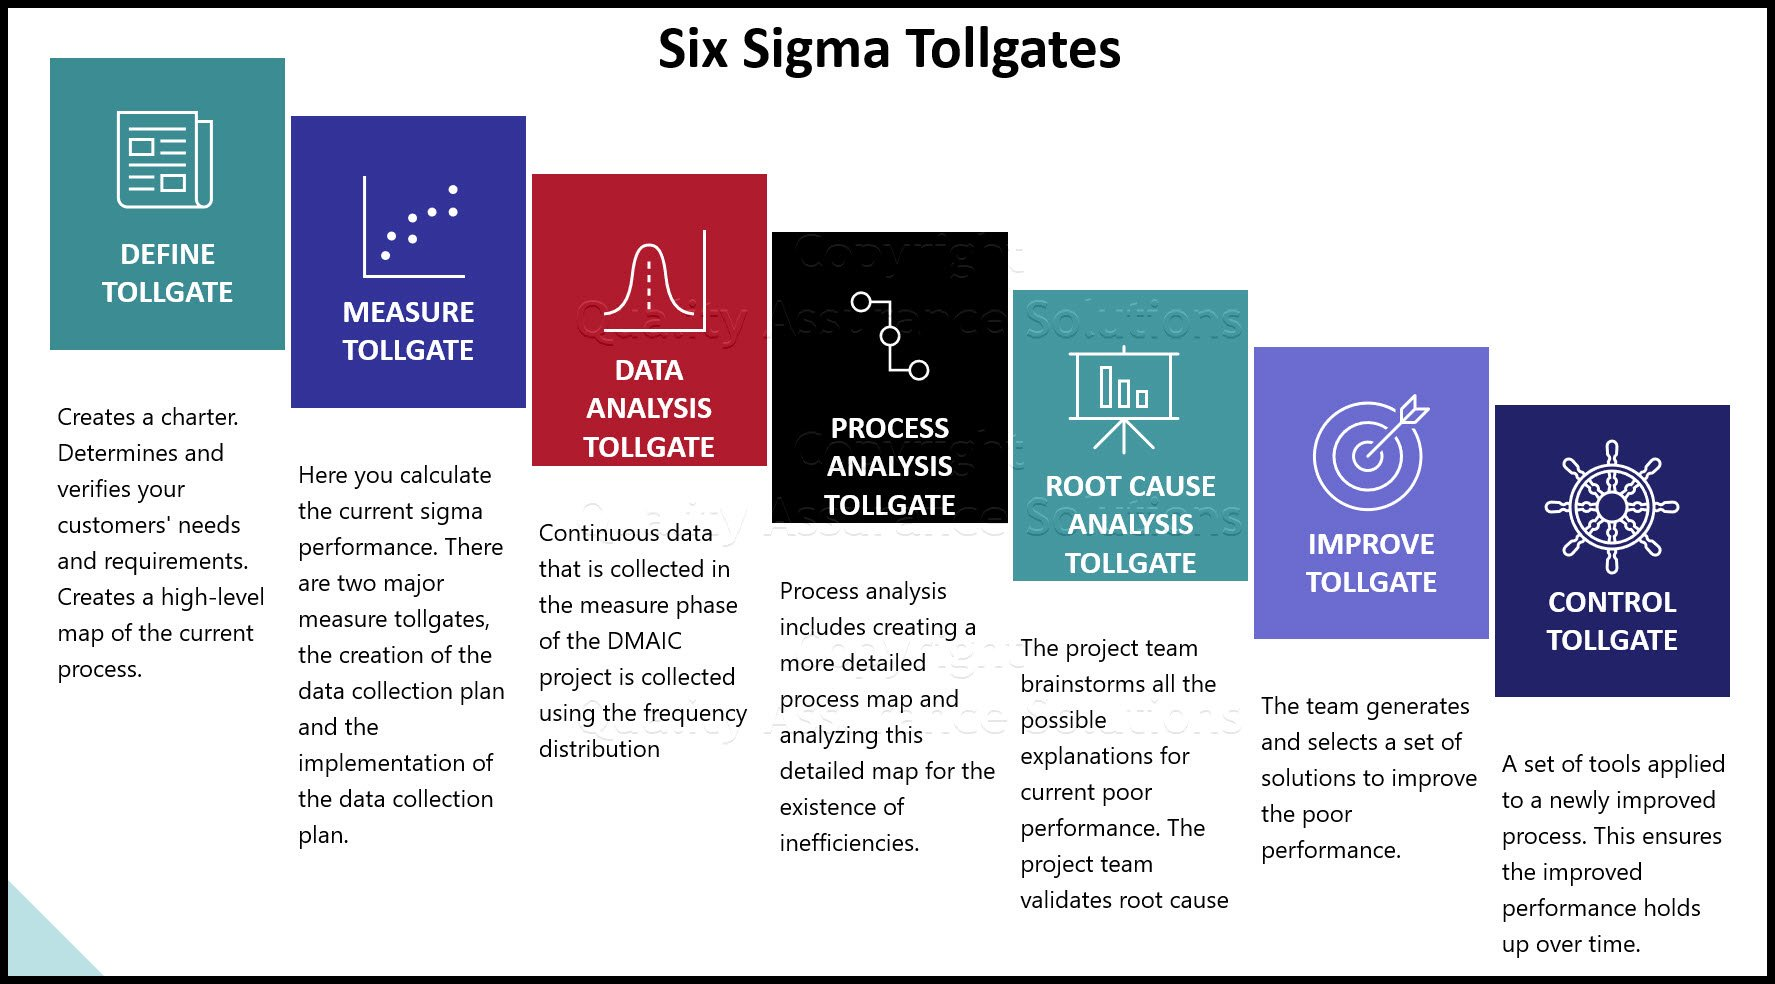 Six Sigma Tollgates